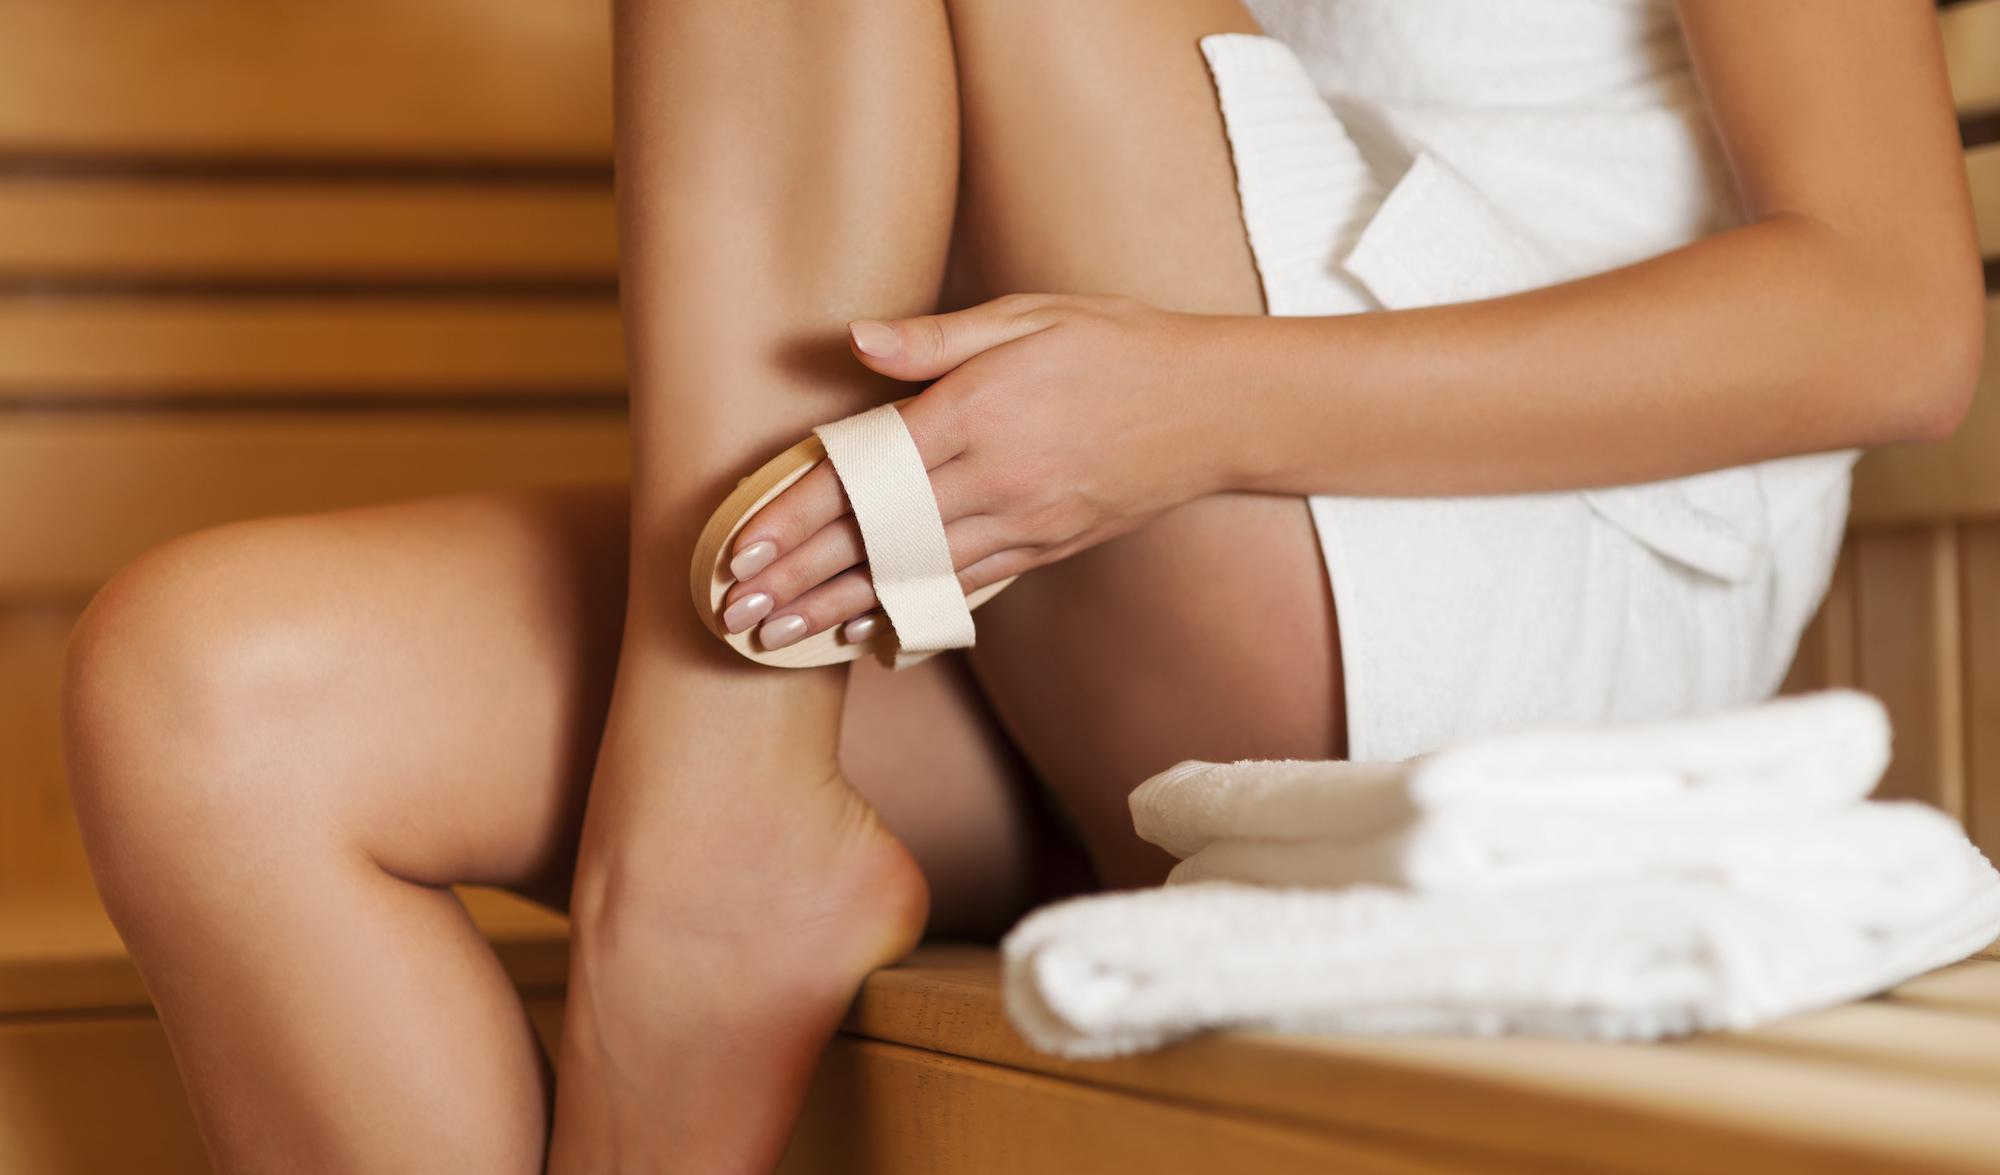 Woman massaging leg in sauna